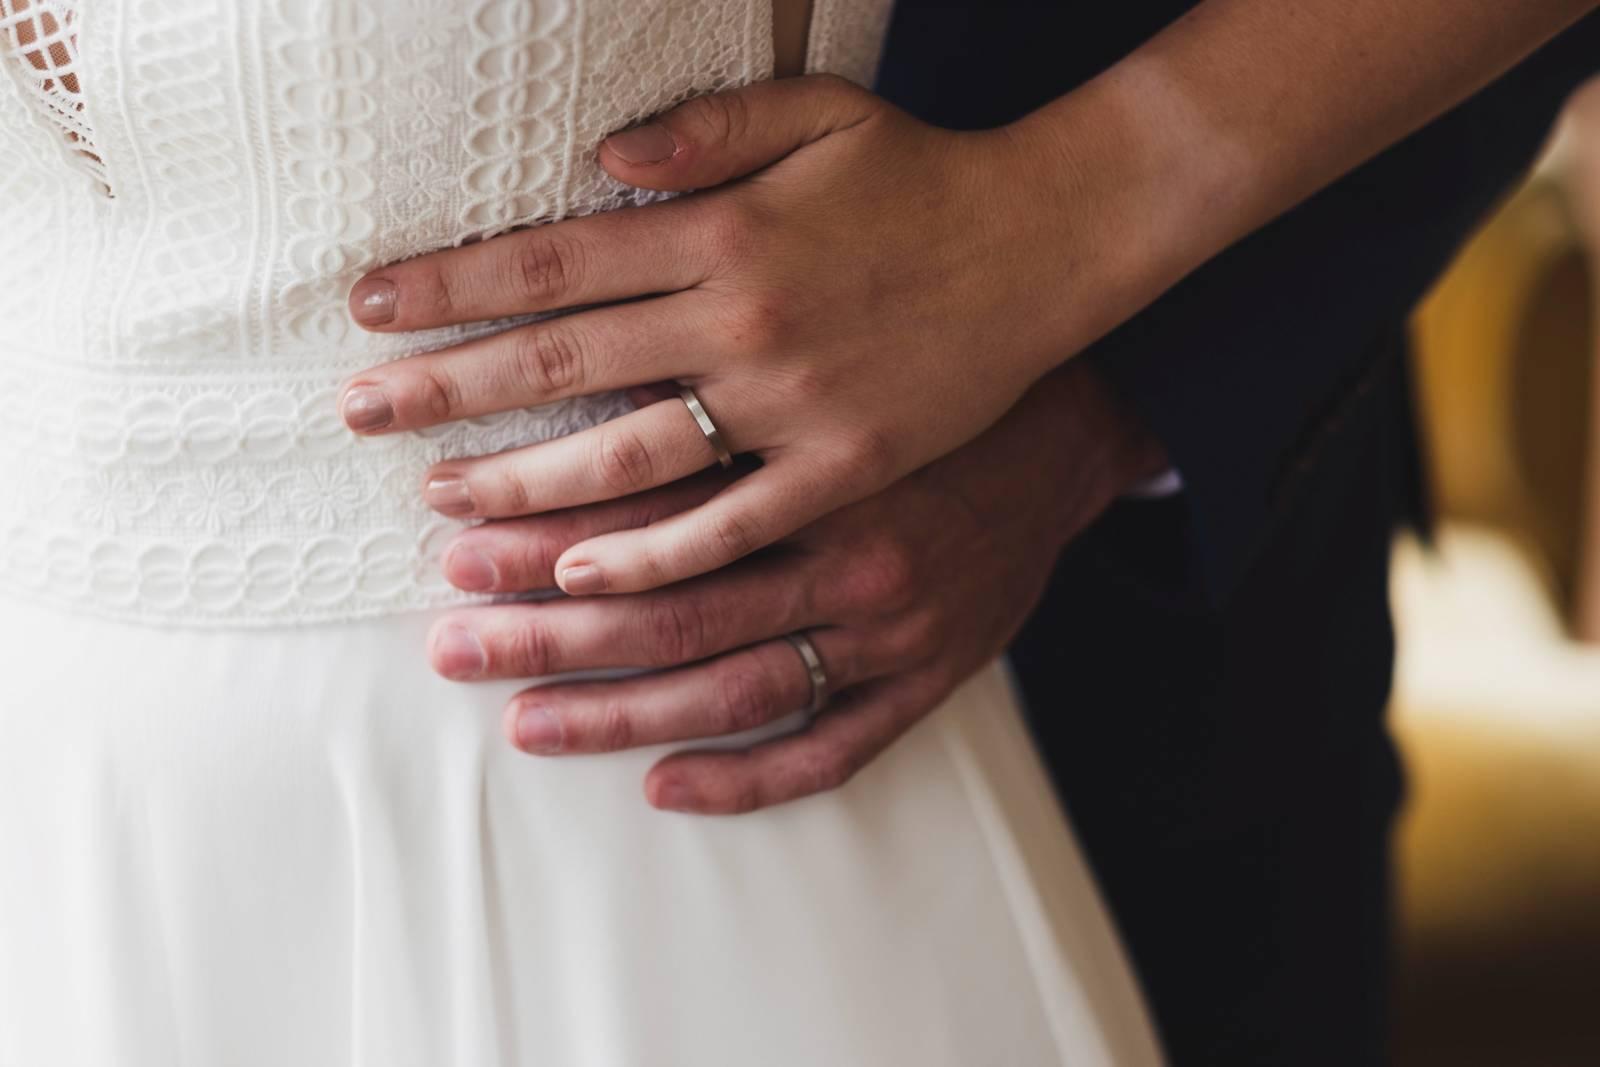 MMAAK - Bruidsjuwelen - Fotograaf Mies Cosemans - House of Weddings 101